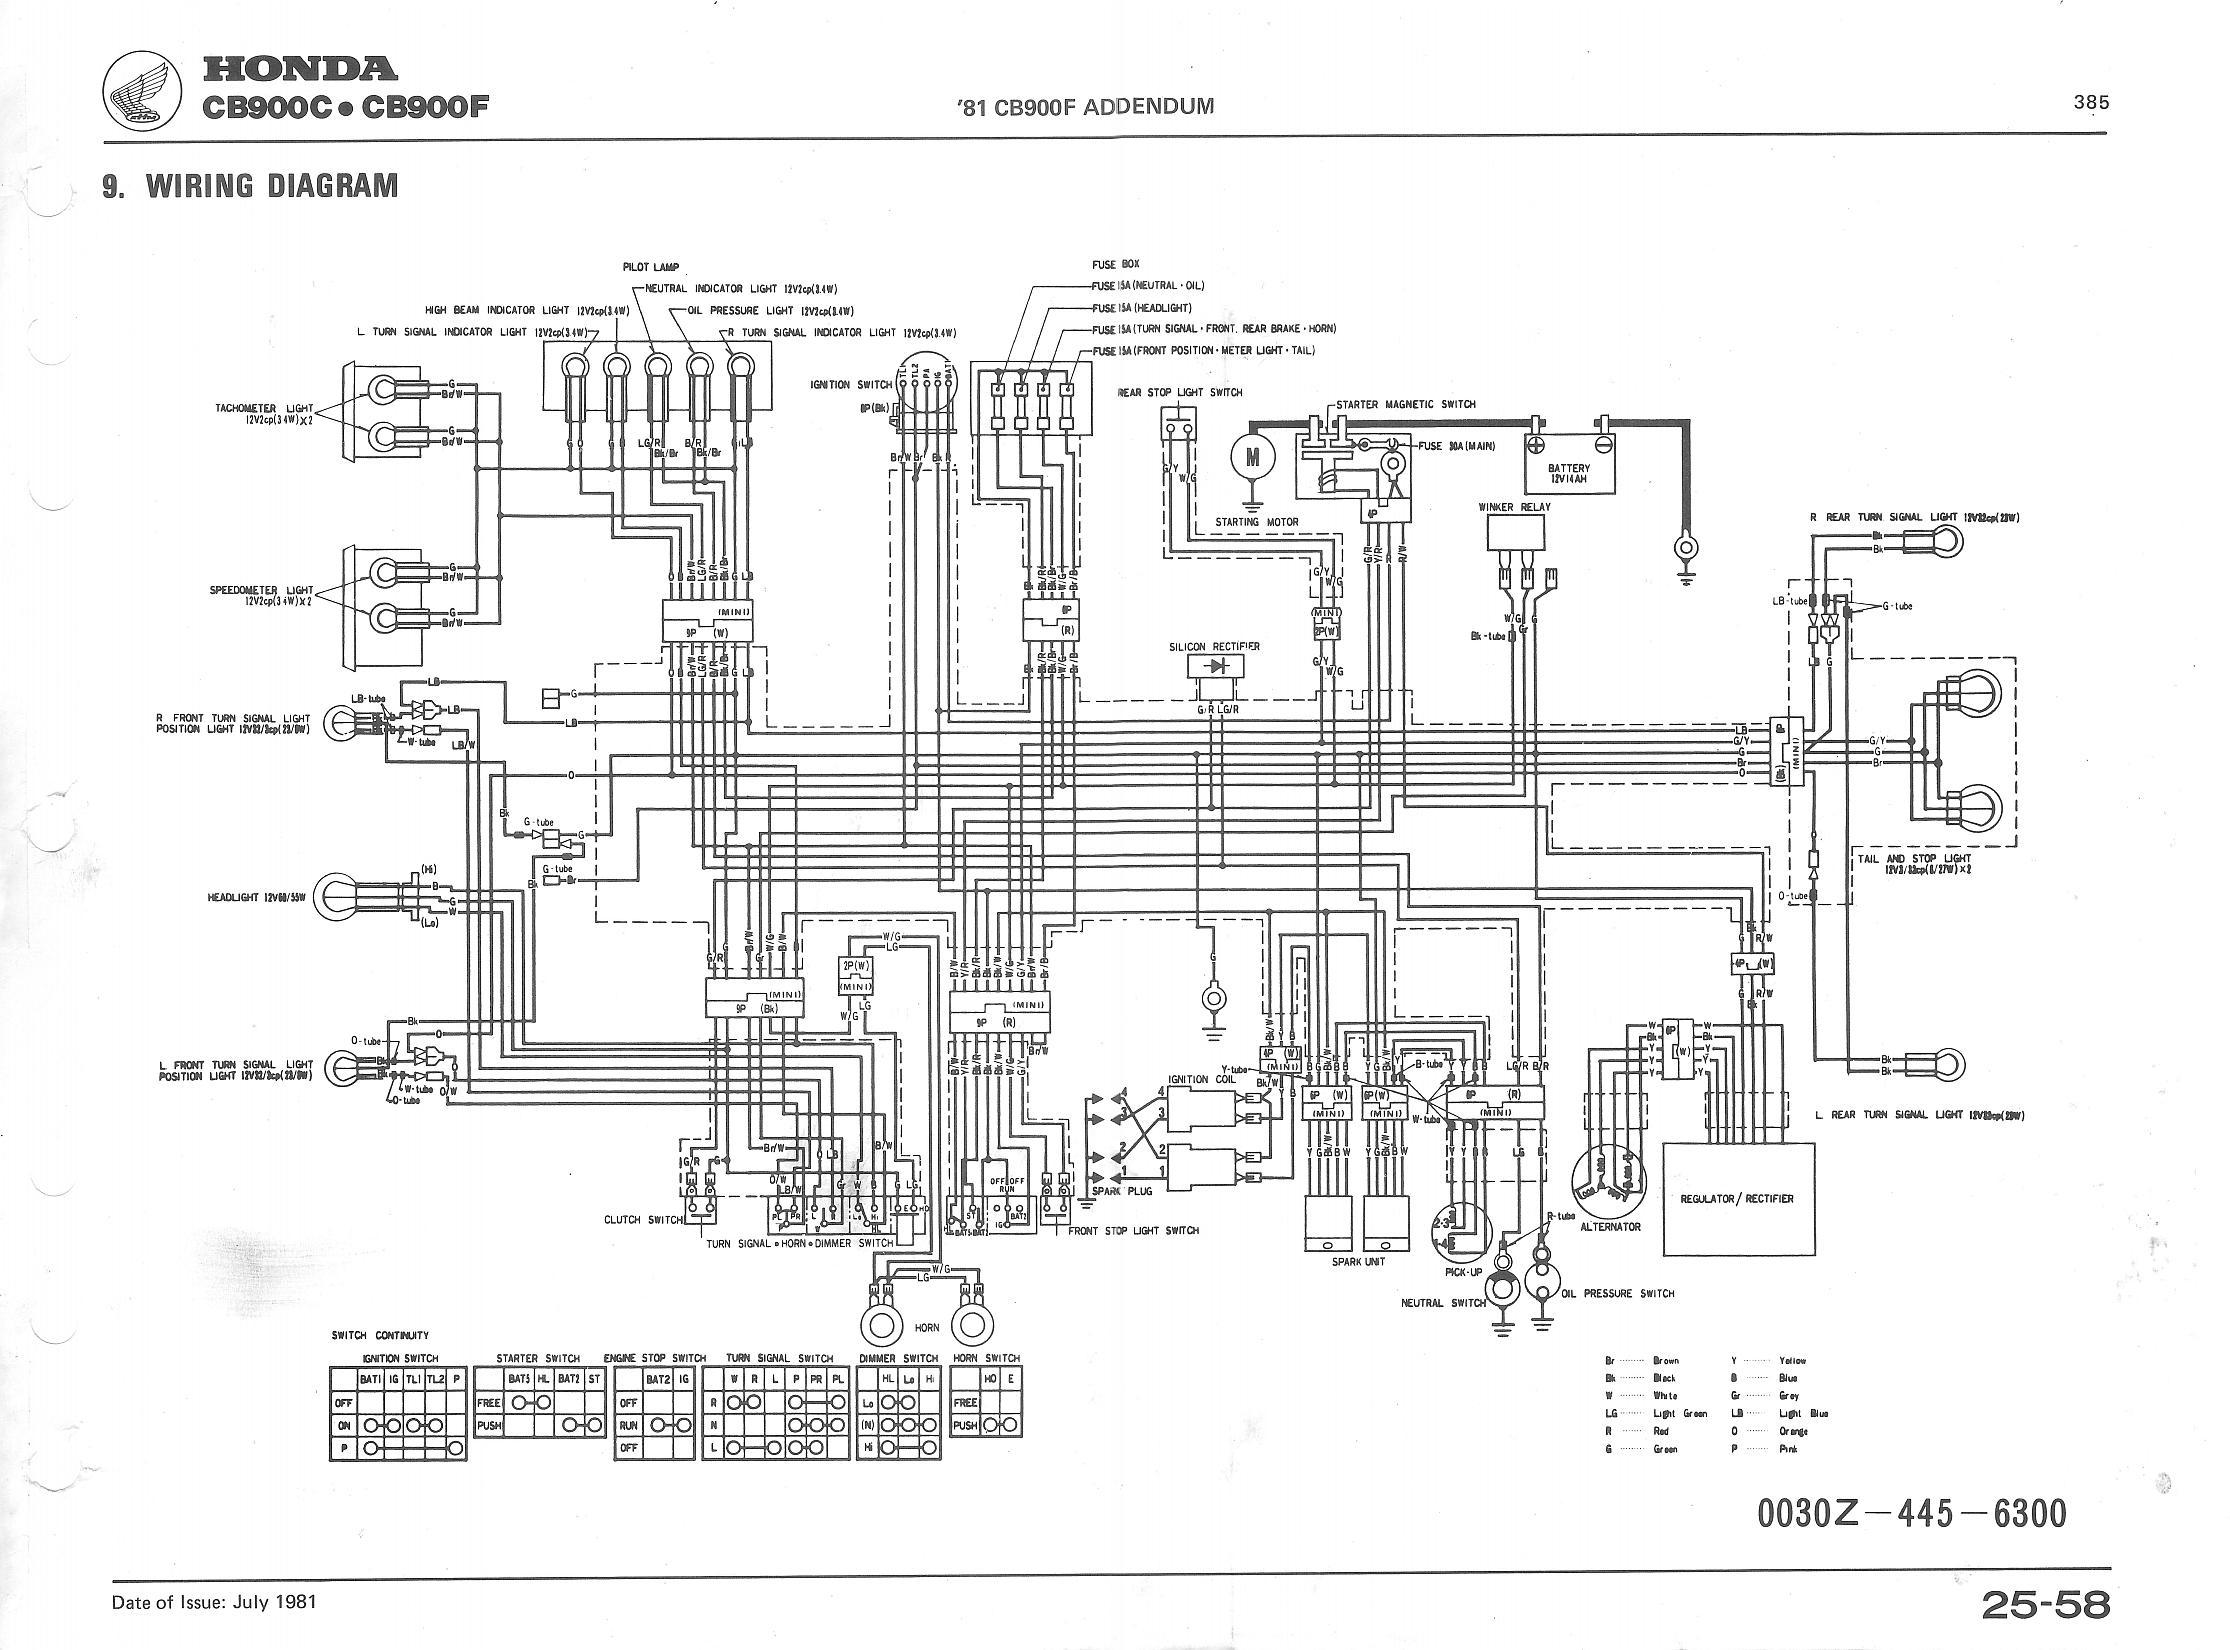 cb900f switch wiring diagram wiring diagram meta cb900f switch wiring diagram wiring diagram local cb900f switch wiring diagram